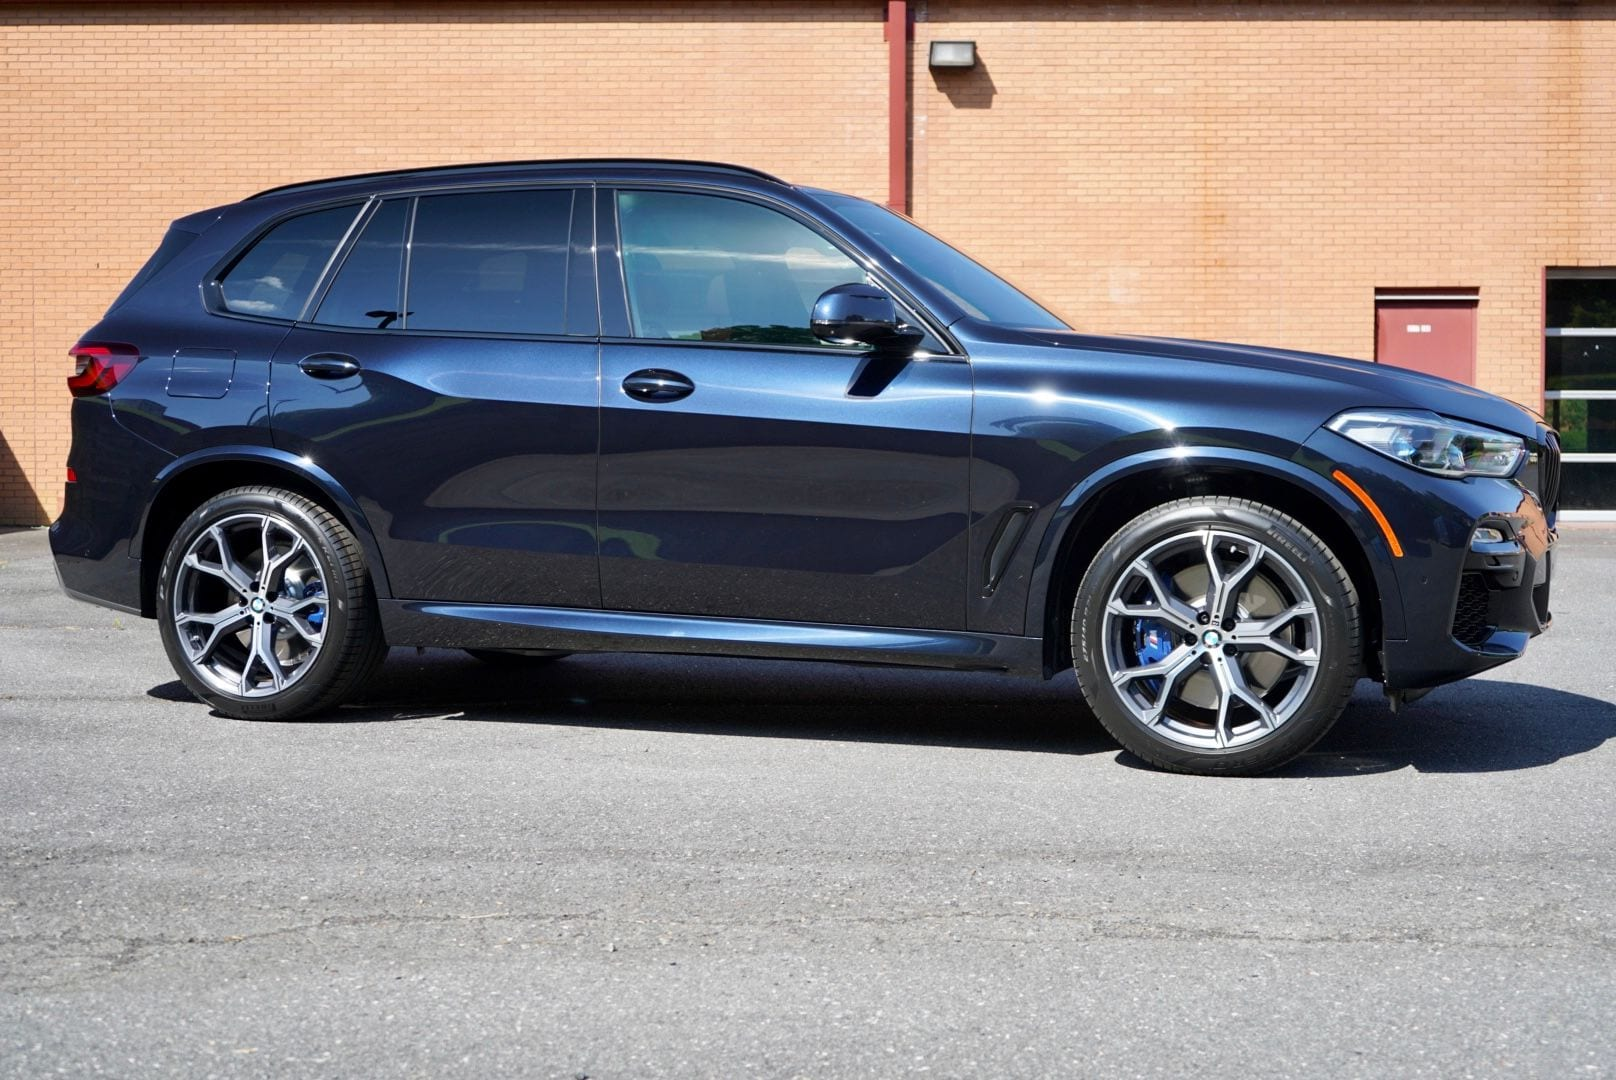 2021 BMW X5 M50i – Full Body STEK DYNOshield, DYNOflex, Ceramic Window Film & Ceramic Coatings